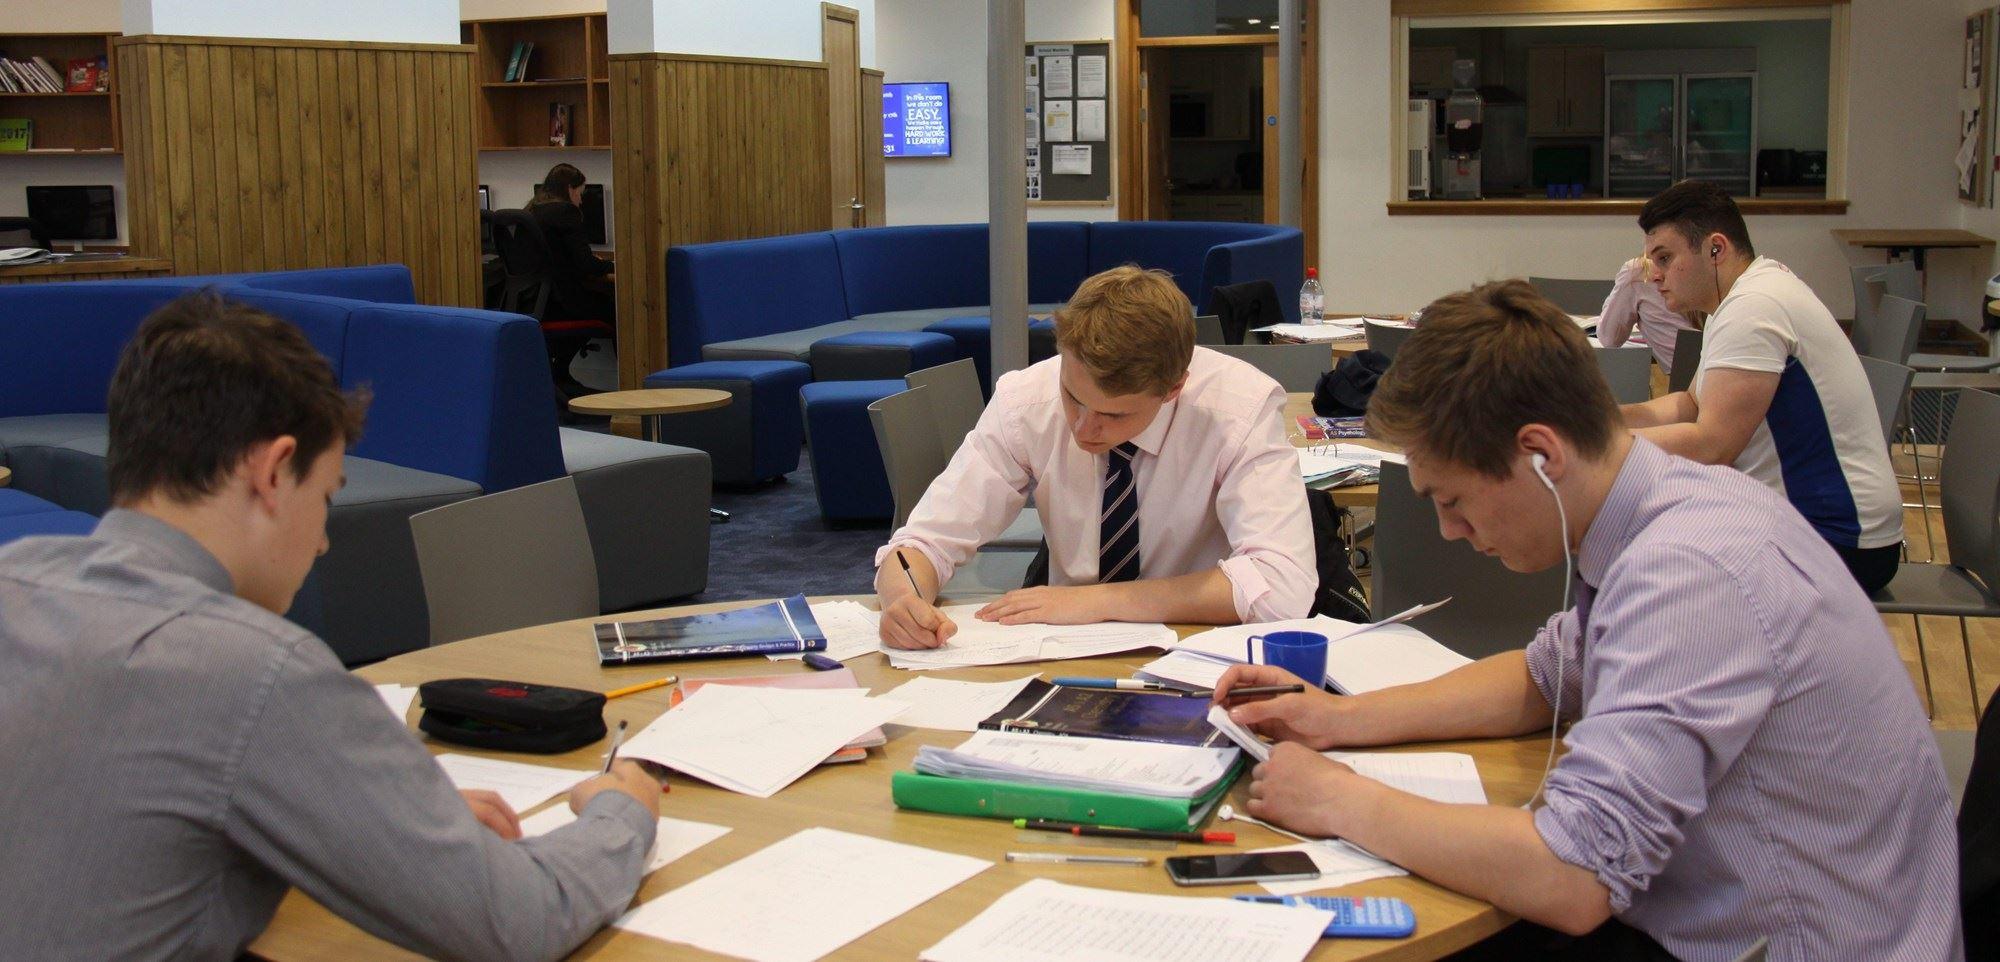 boys-studying